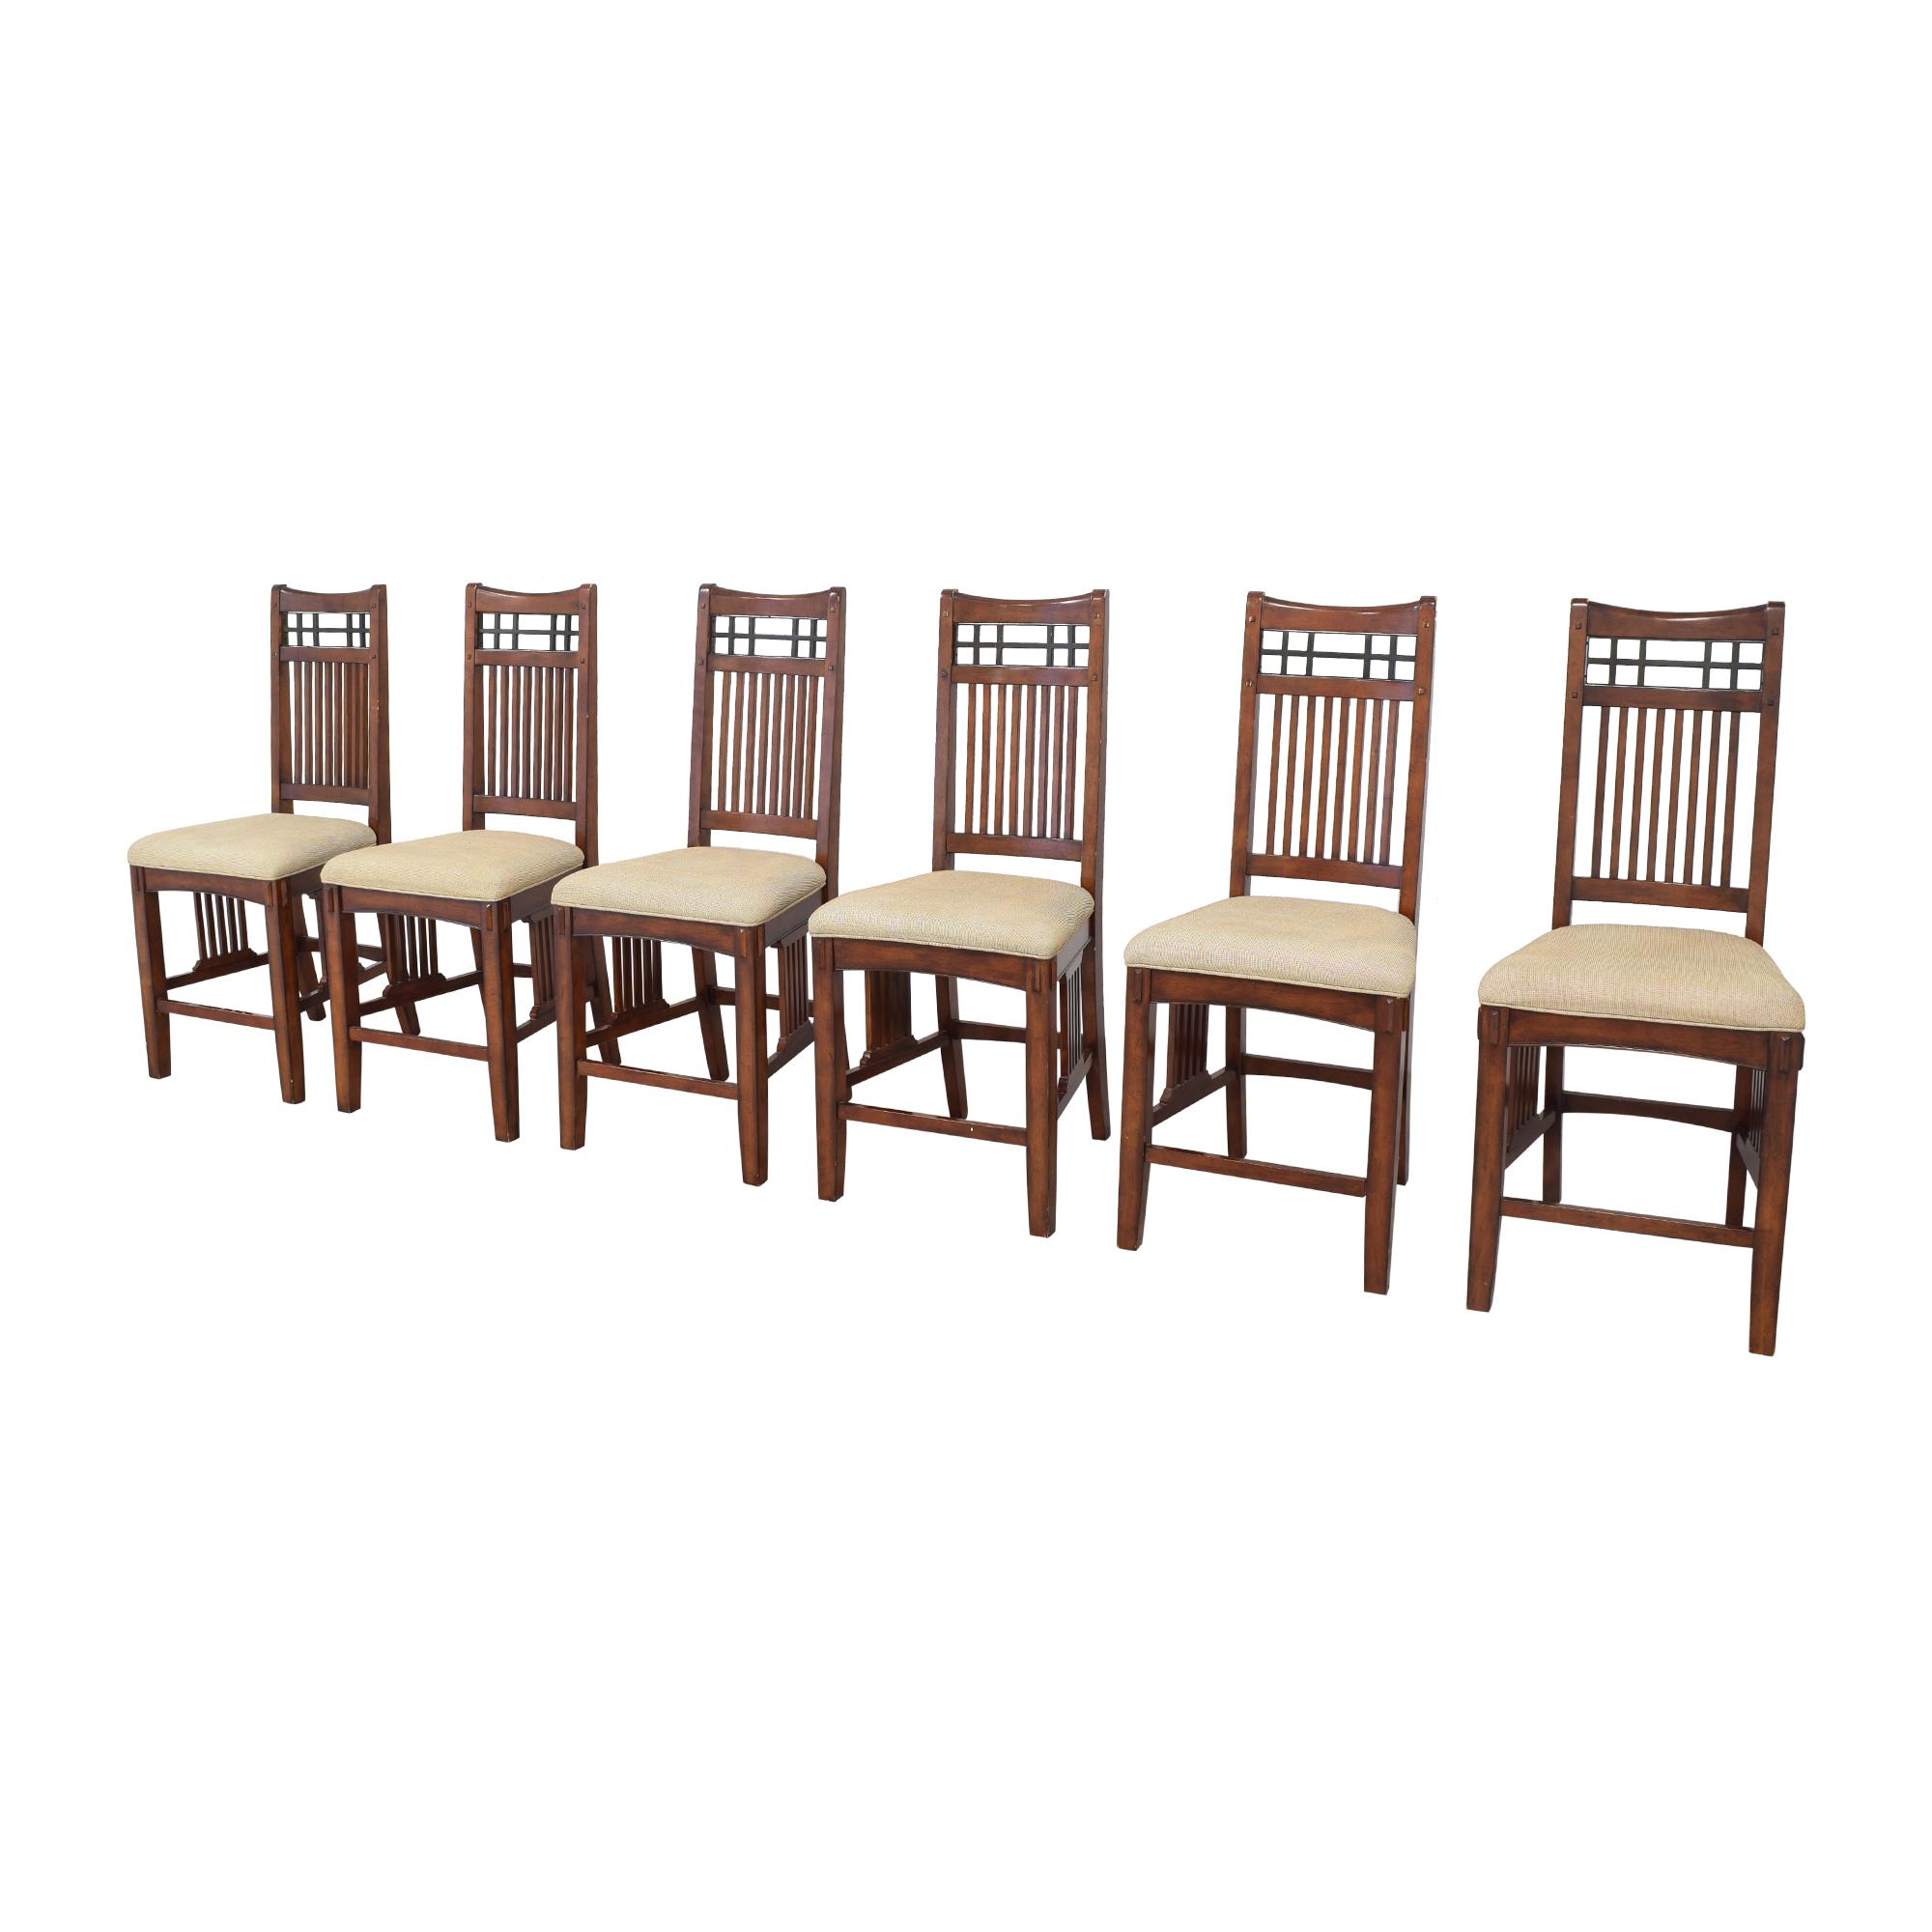 Broyhill Furniture Broyhill Vantana Upholstered Chairs dimensions